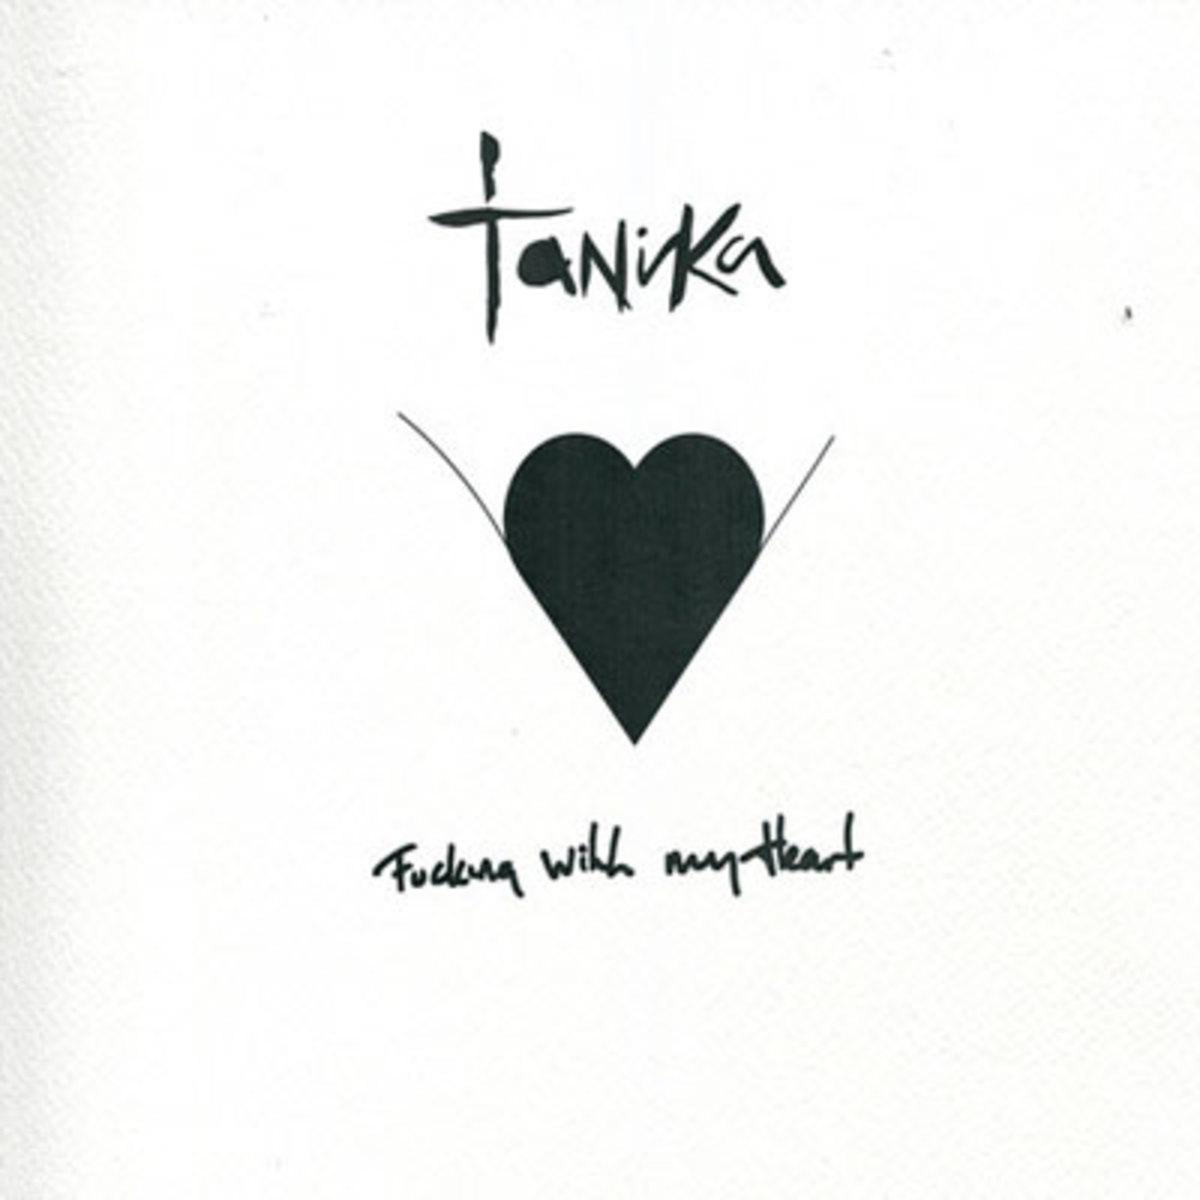 tanika-fkingwithmyheart.jpg